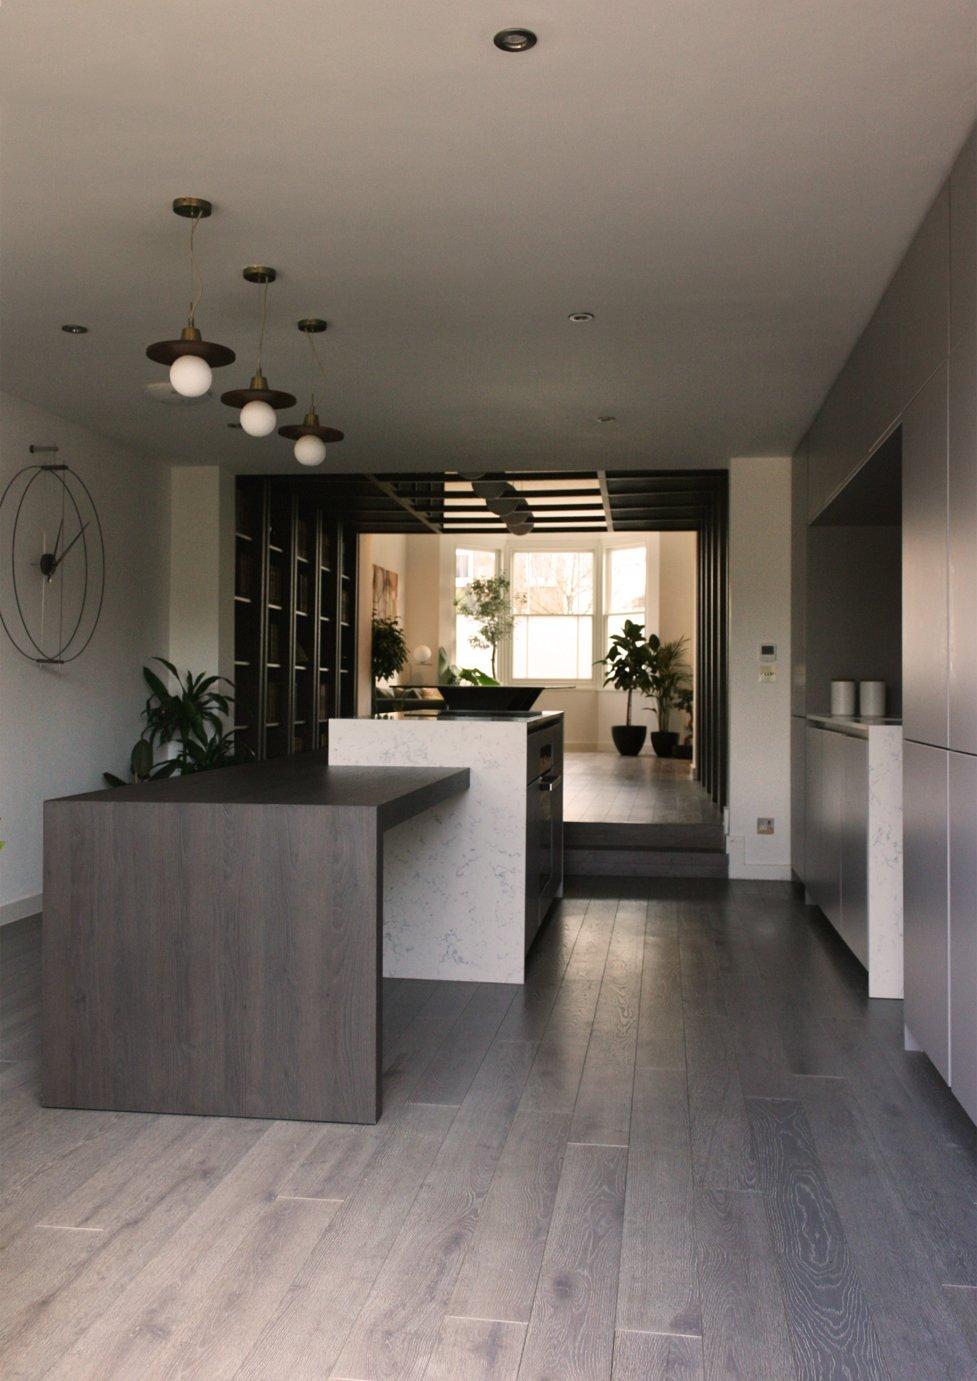 Kitchen, Engineered Quartz Counter, Open Cabinet, Light Hardwood Floor, Subway Tile Backsplashe, and Pendant Lighting Kitchen with bespoke integrated informal dining table  The Yellow Door by Tactus Design Workshop